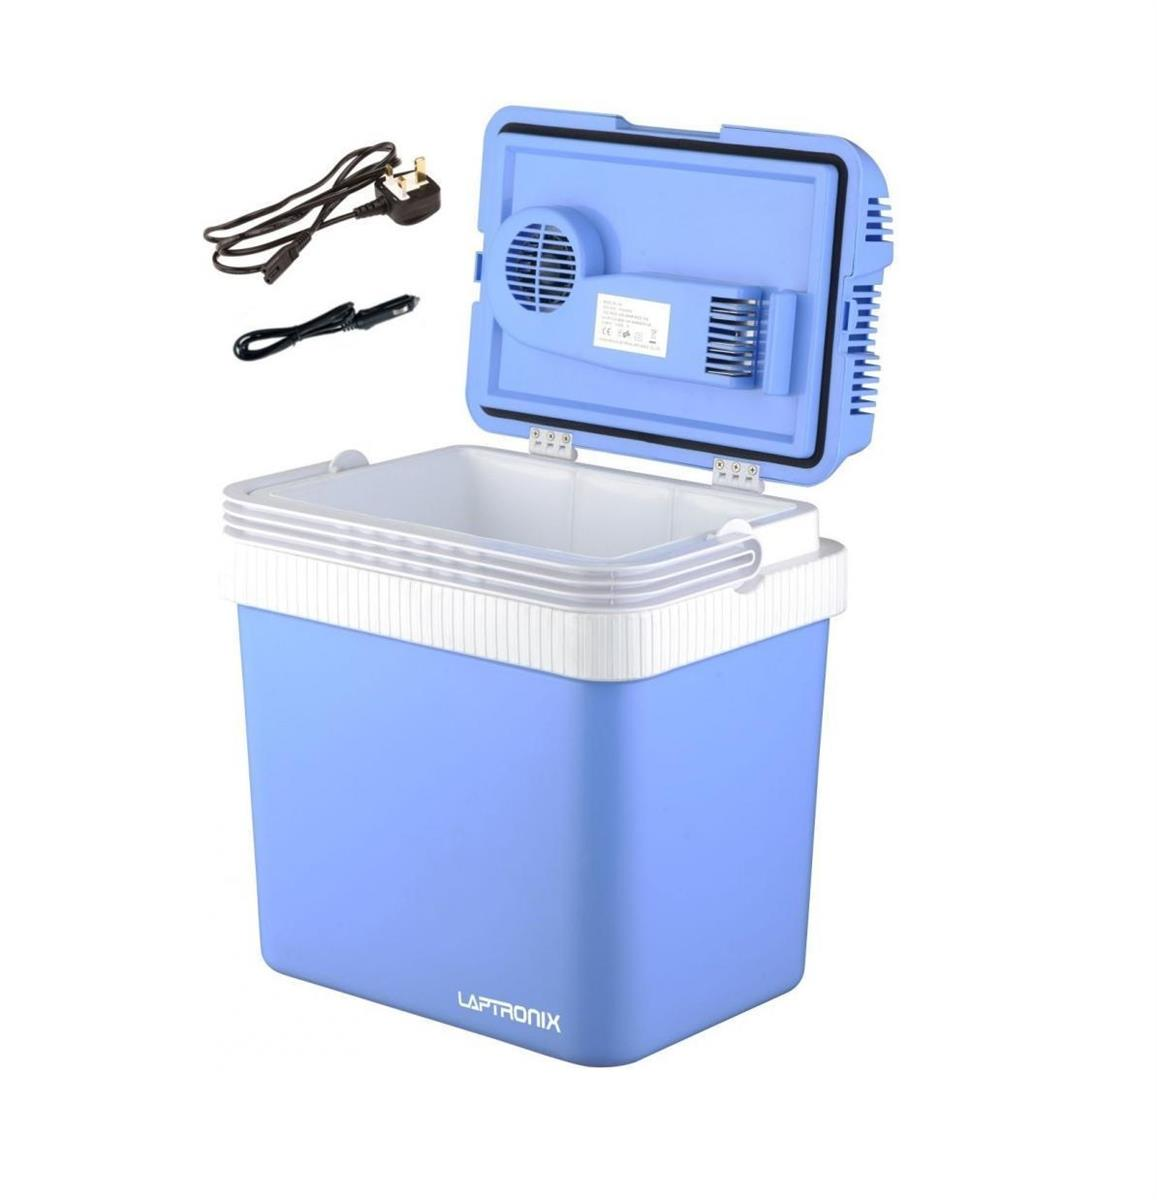 u002724L PORTABLE COOL BOX ELECTRIC COOLER CAR VAN ICE FRIDGE WITH 12V u0026 240V ADAPTER  sc 1 st  Laptronix & 24L PORTABLE COOL BOX ELECTRIC COOLER CAR VAN ICE FRIDGE WITH 12V ... Aboutintivar.Com